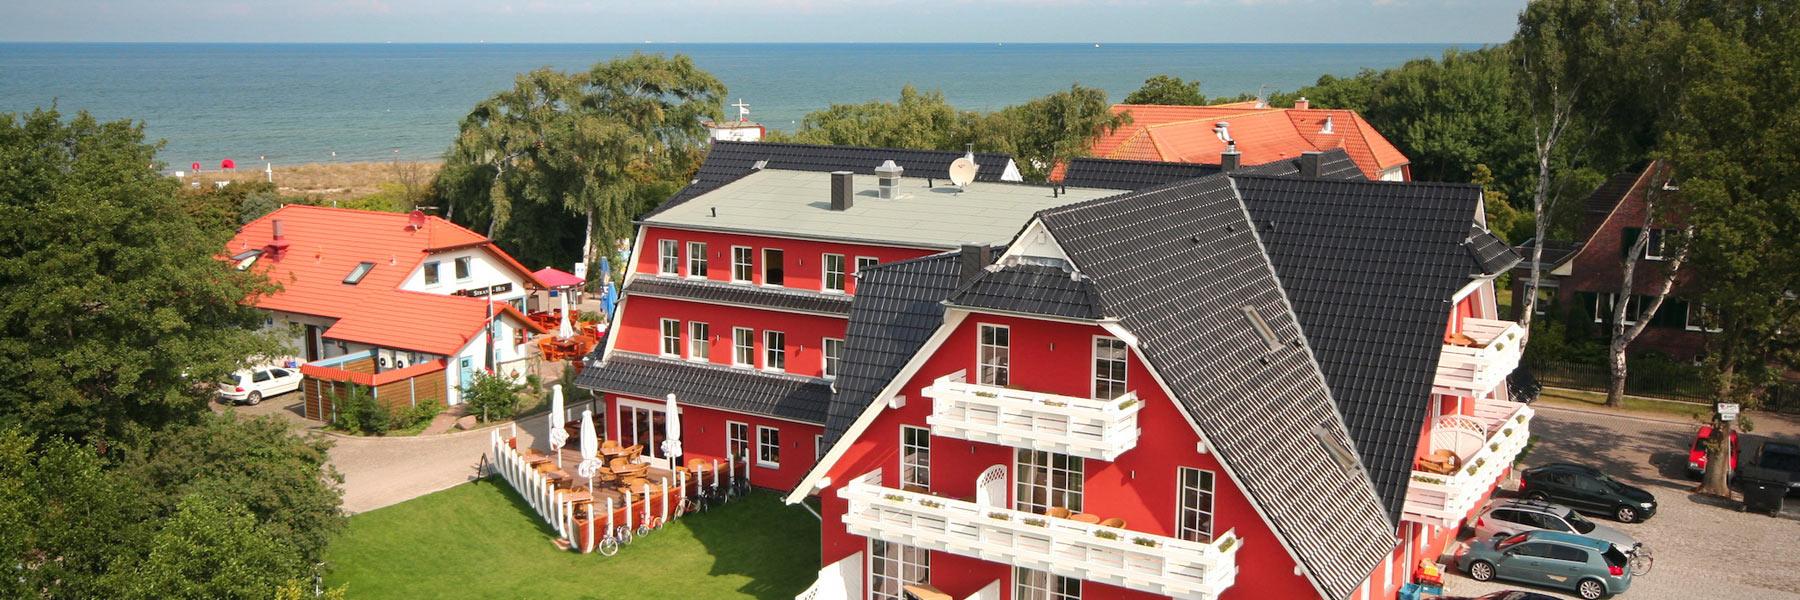 Hotel - Strandhotel Deichgraf Graal-Müritz